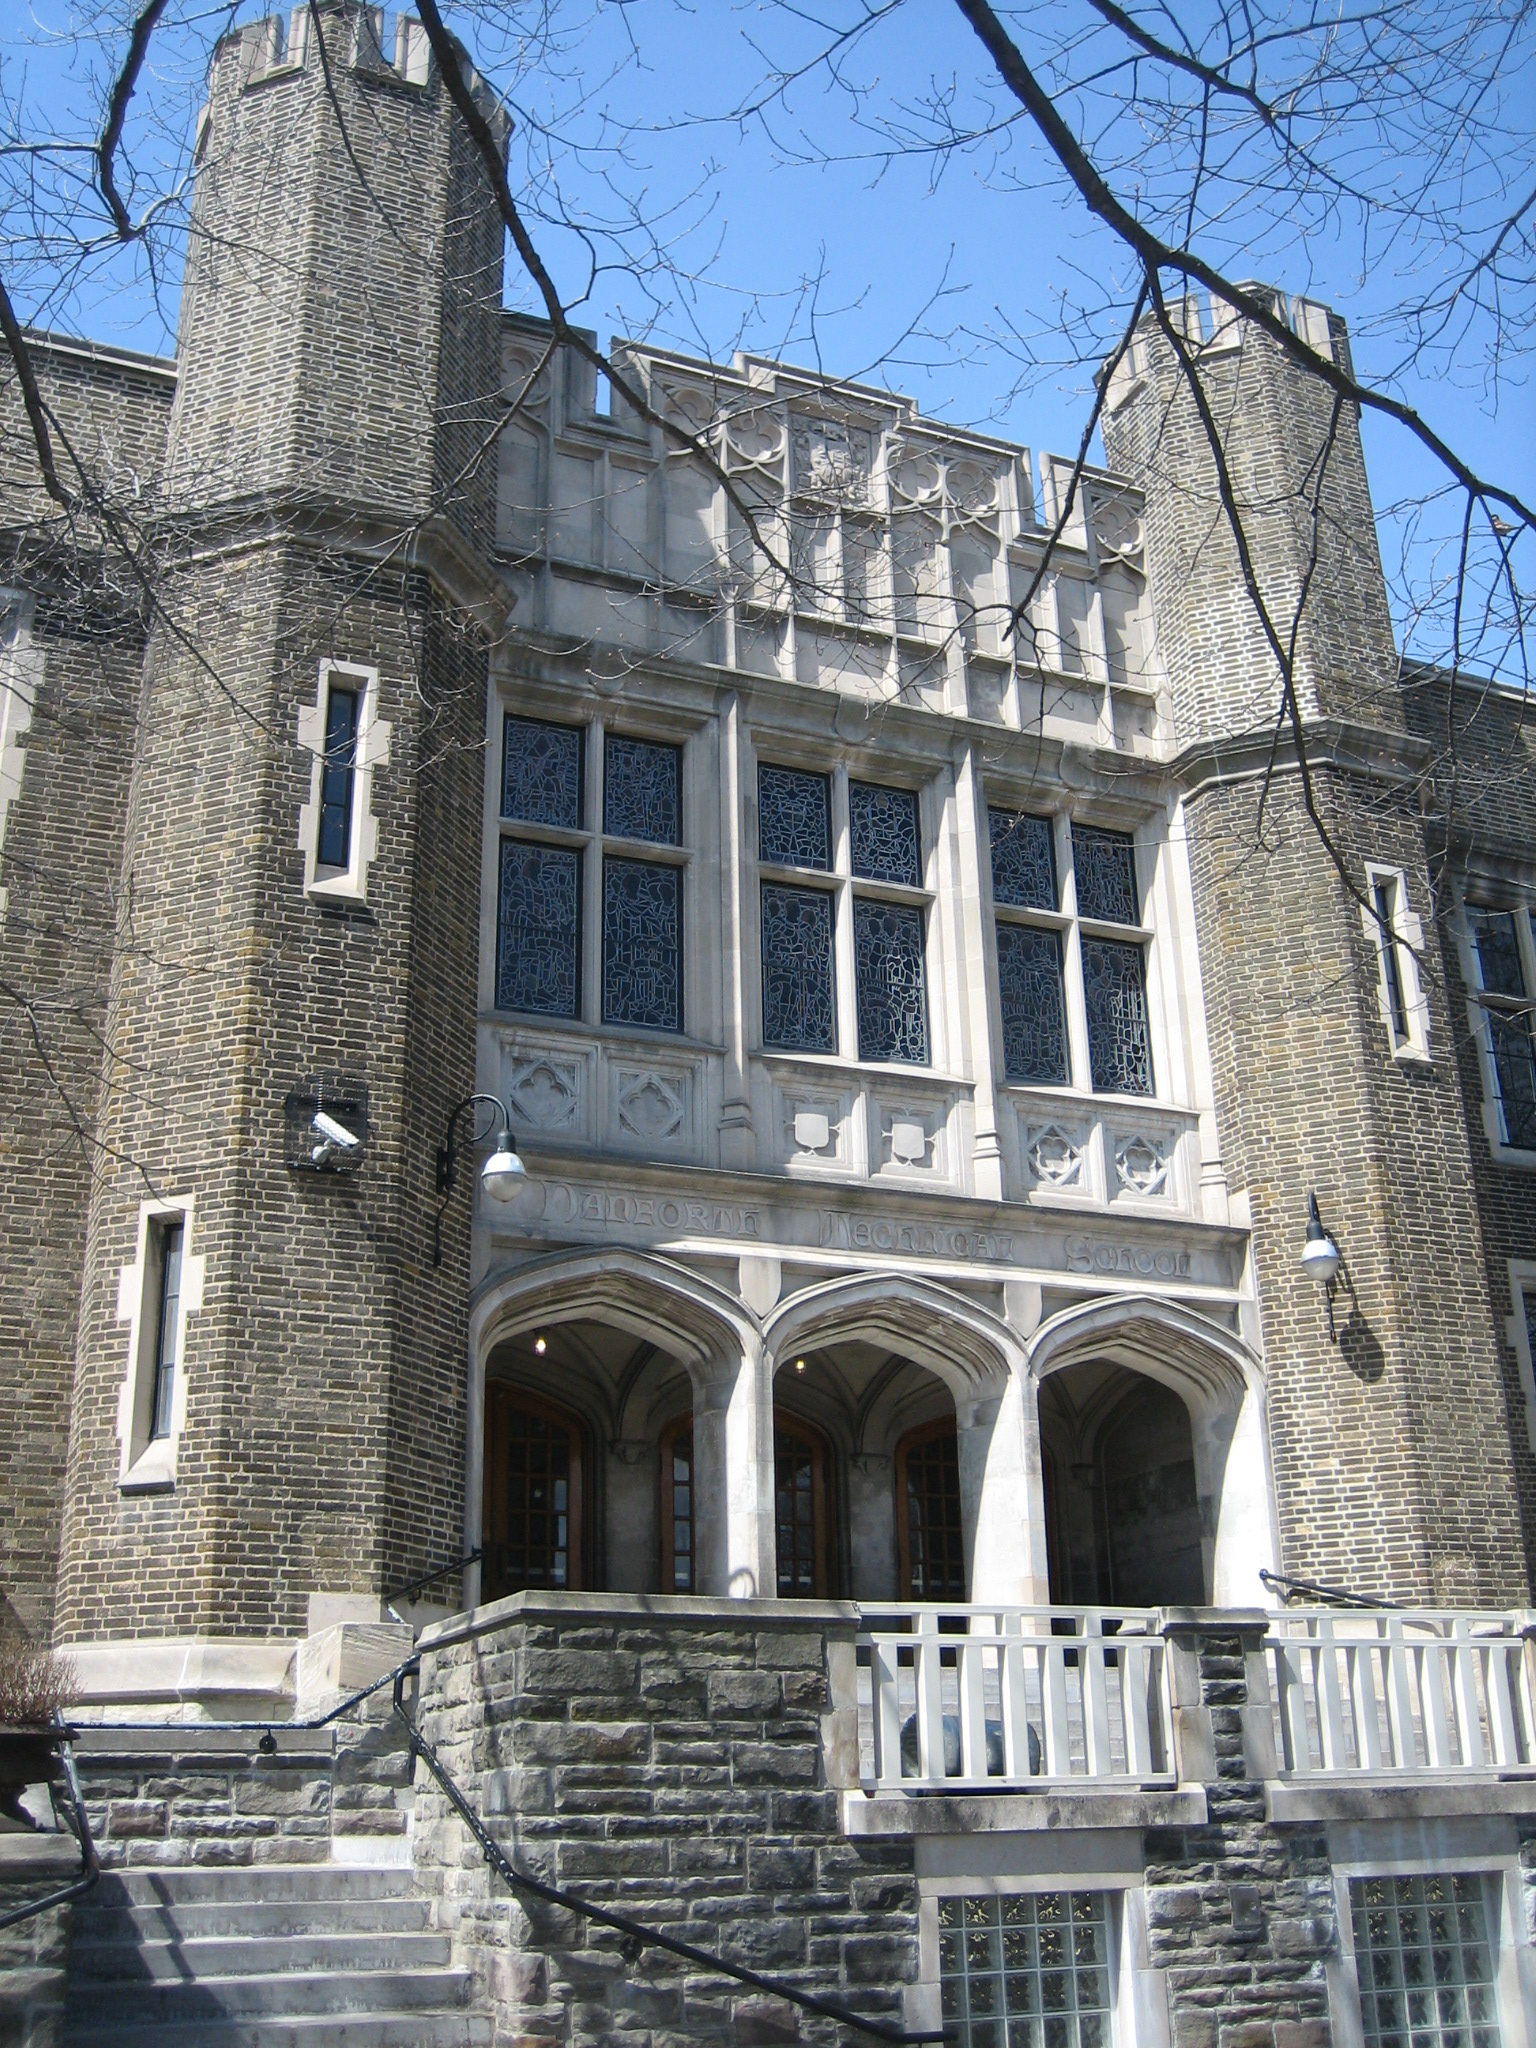 Danforth Collegiate And Technical Institute Wikipedia